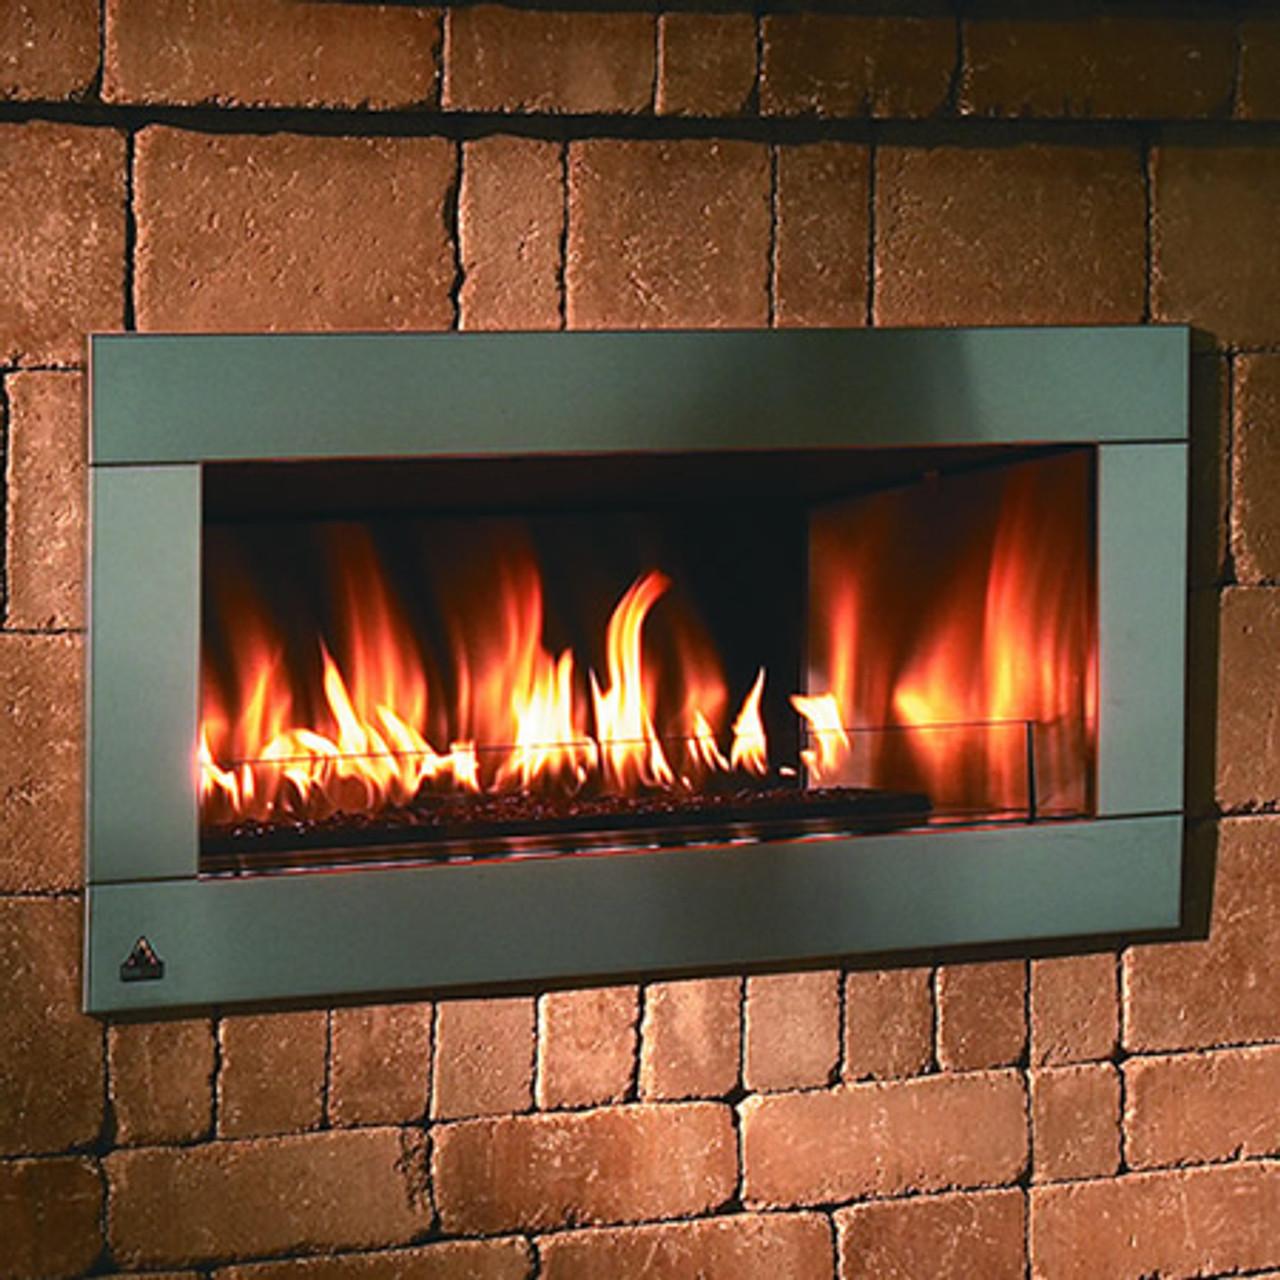 Firegear Od42 Outdoor Linear Gas Fireplace